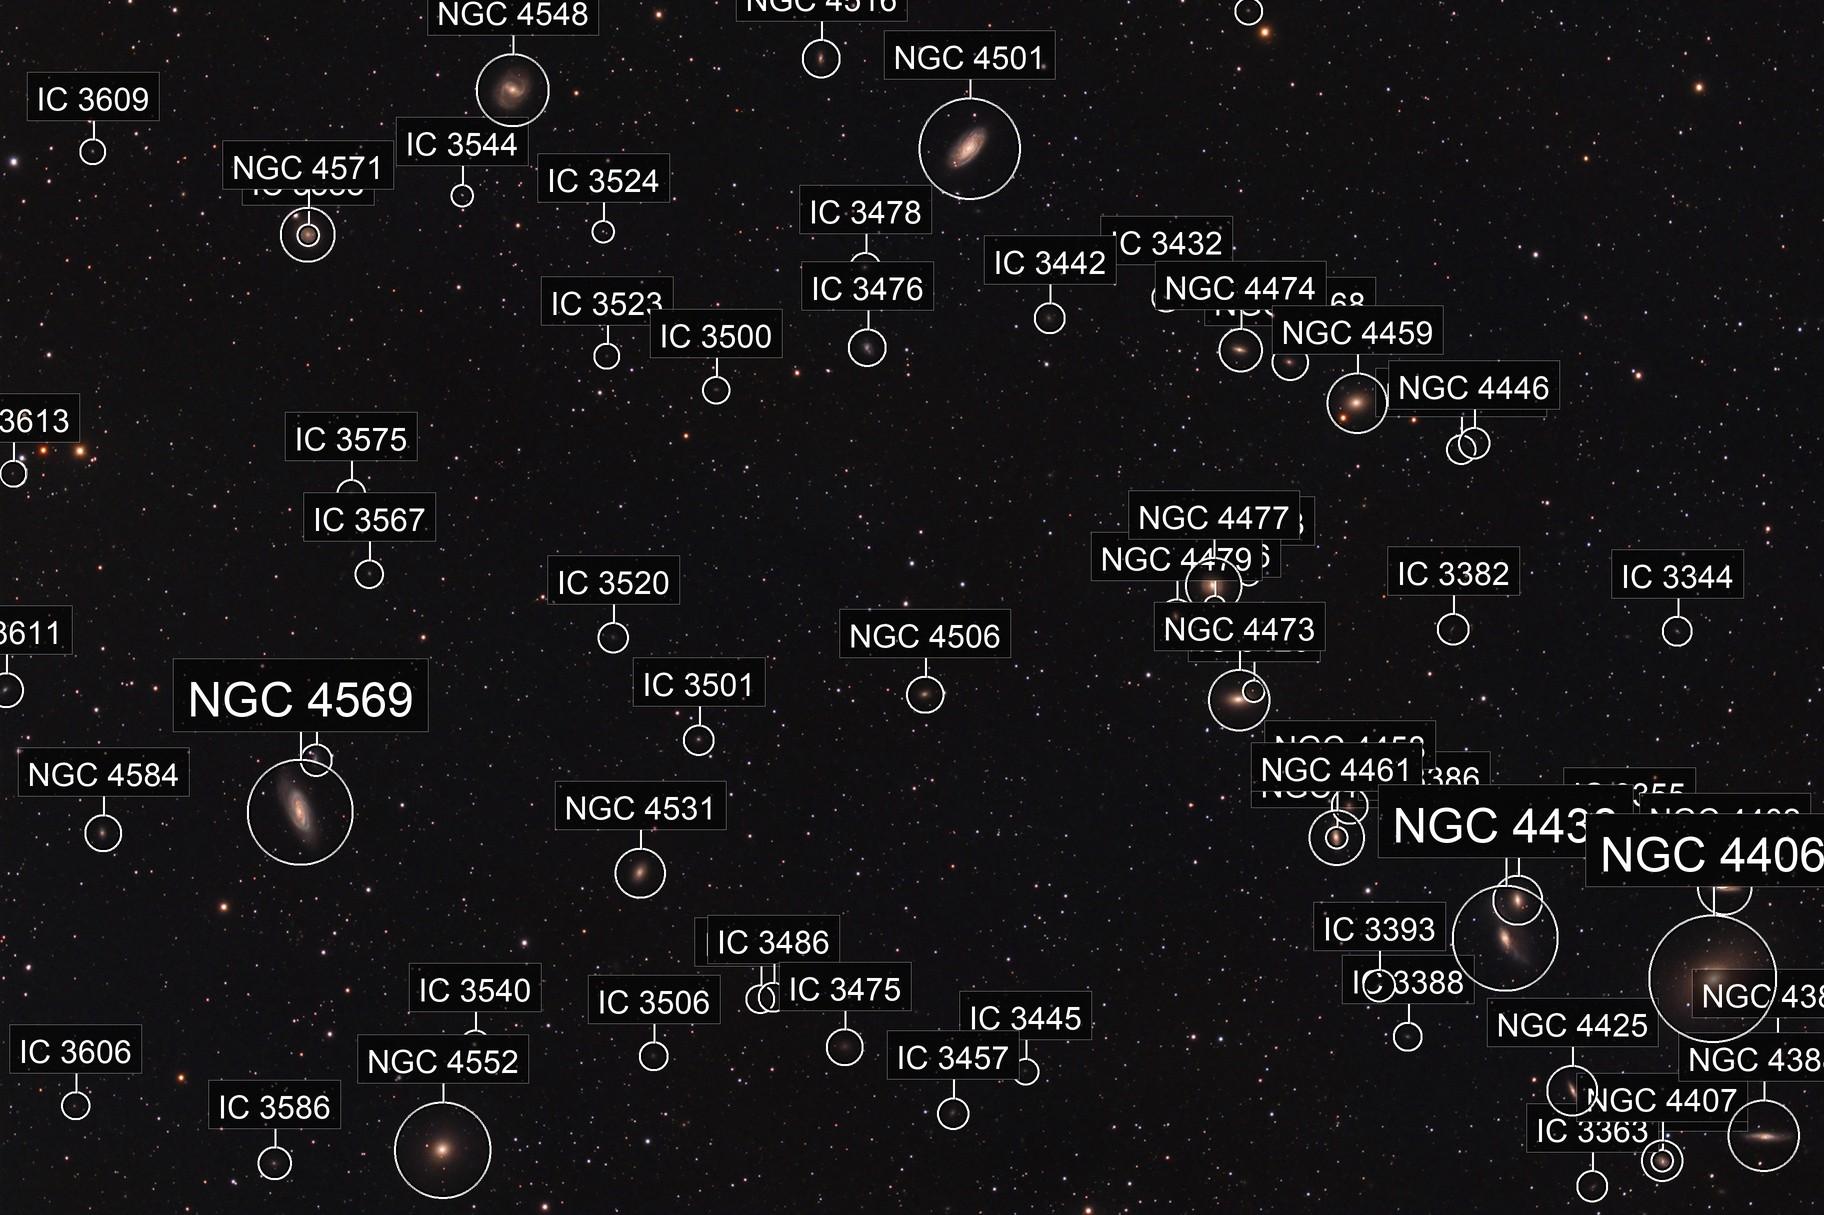 Coma Berenices Galaxies